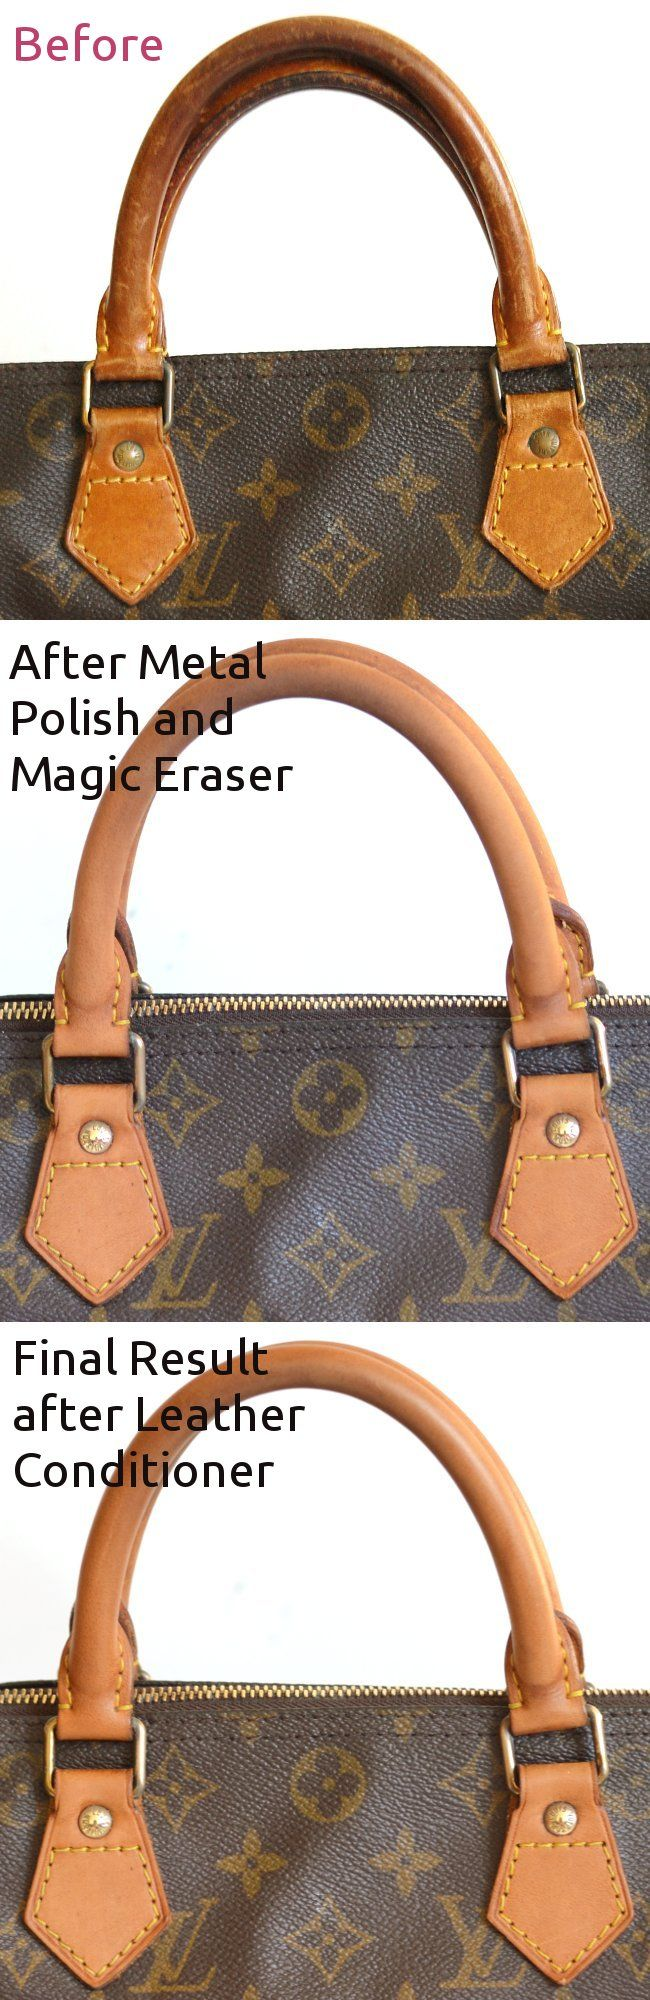 Louis Vuitton leather handles refurbishment lighten and even patina